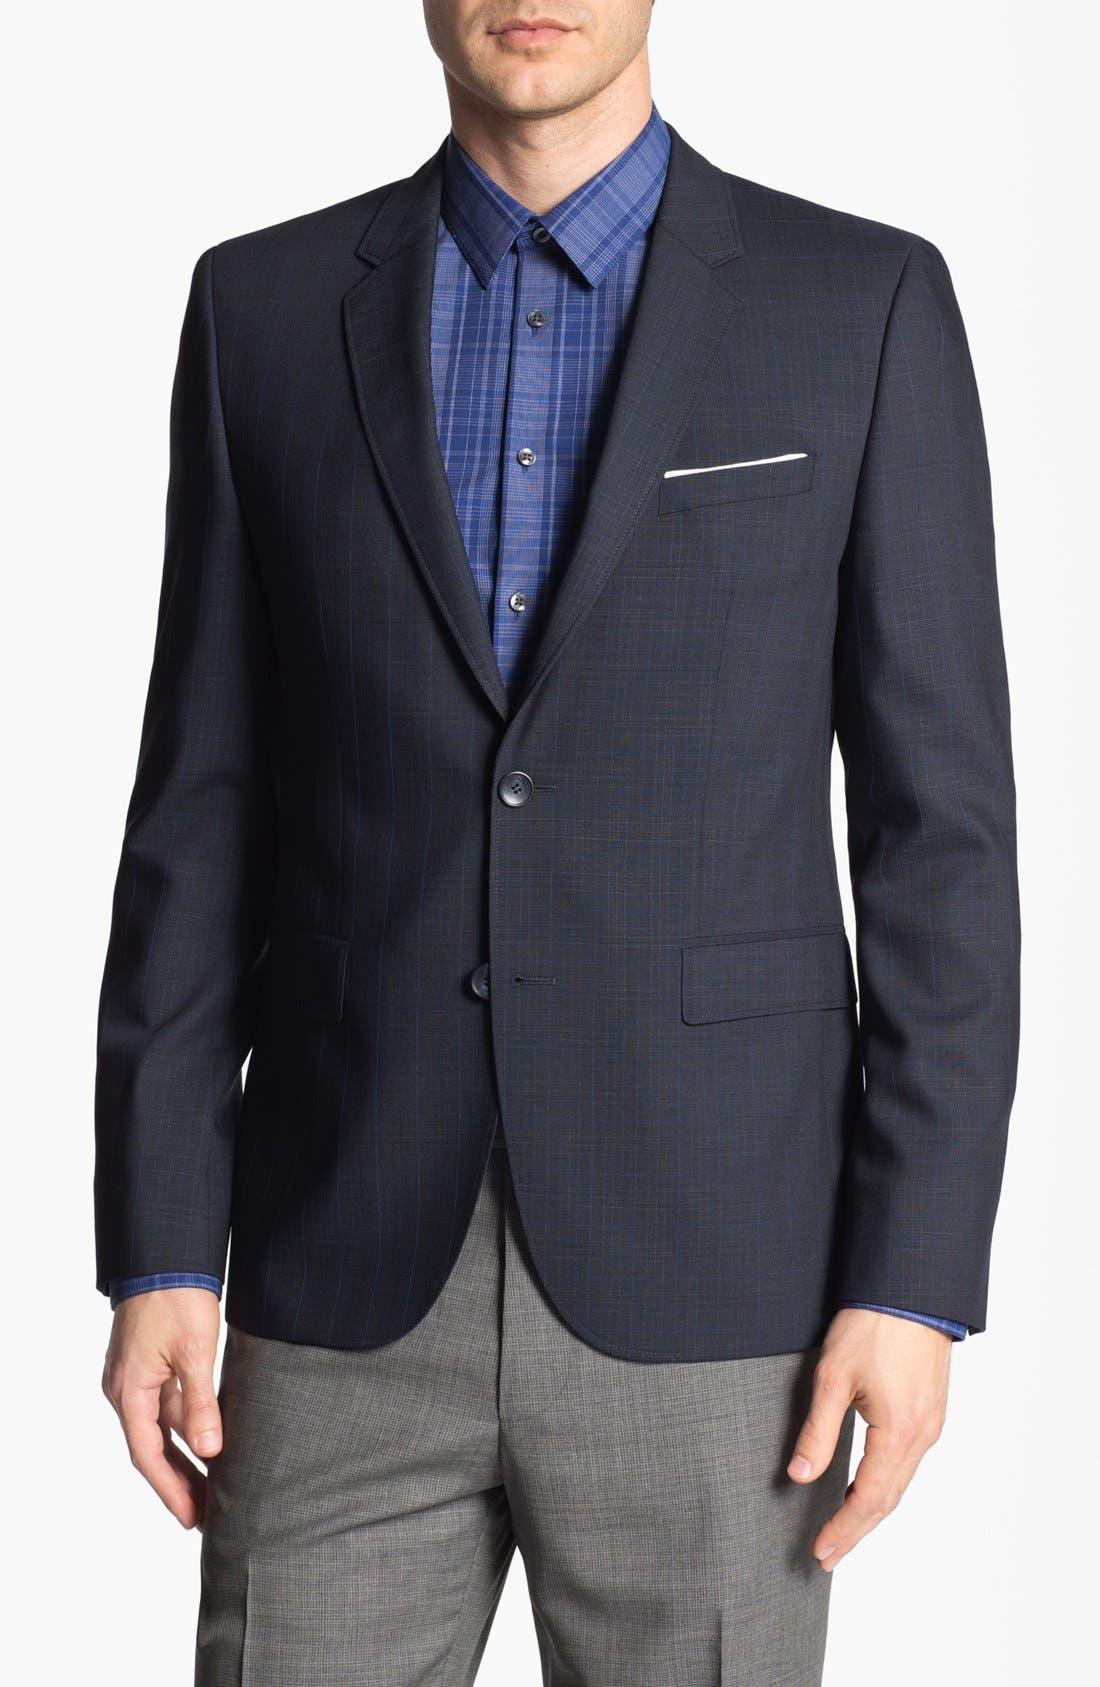 Alternate Image 1 Selected - HUGO 'Aeris' Extra Trim Fit Plaid Sportcoat